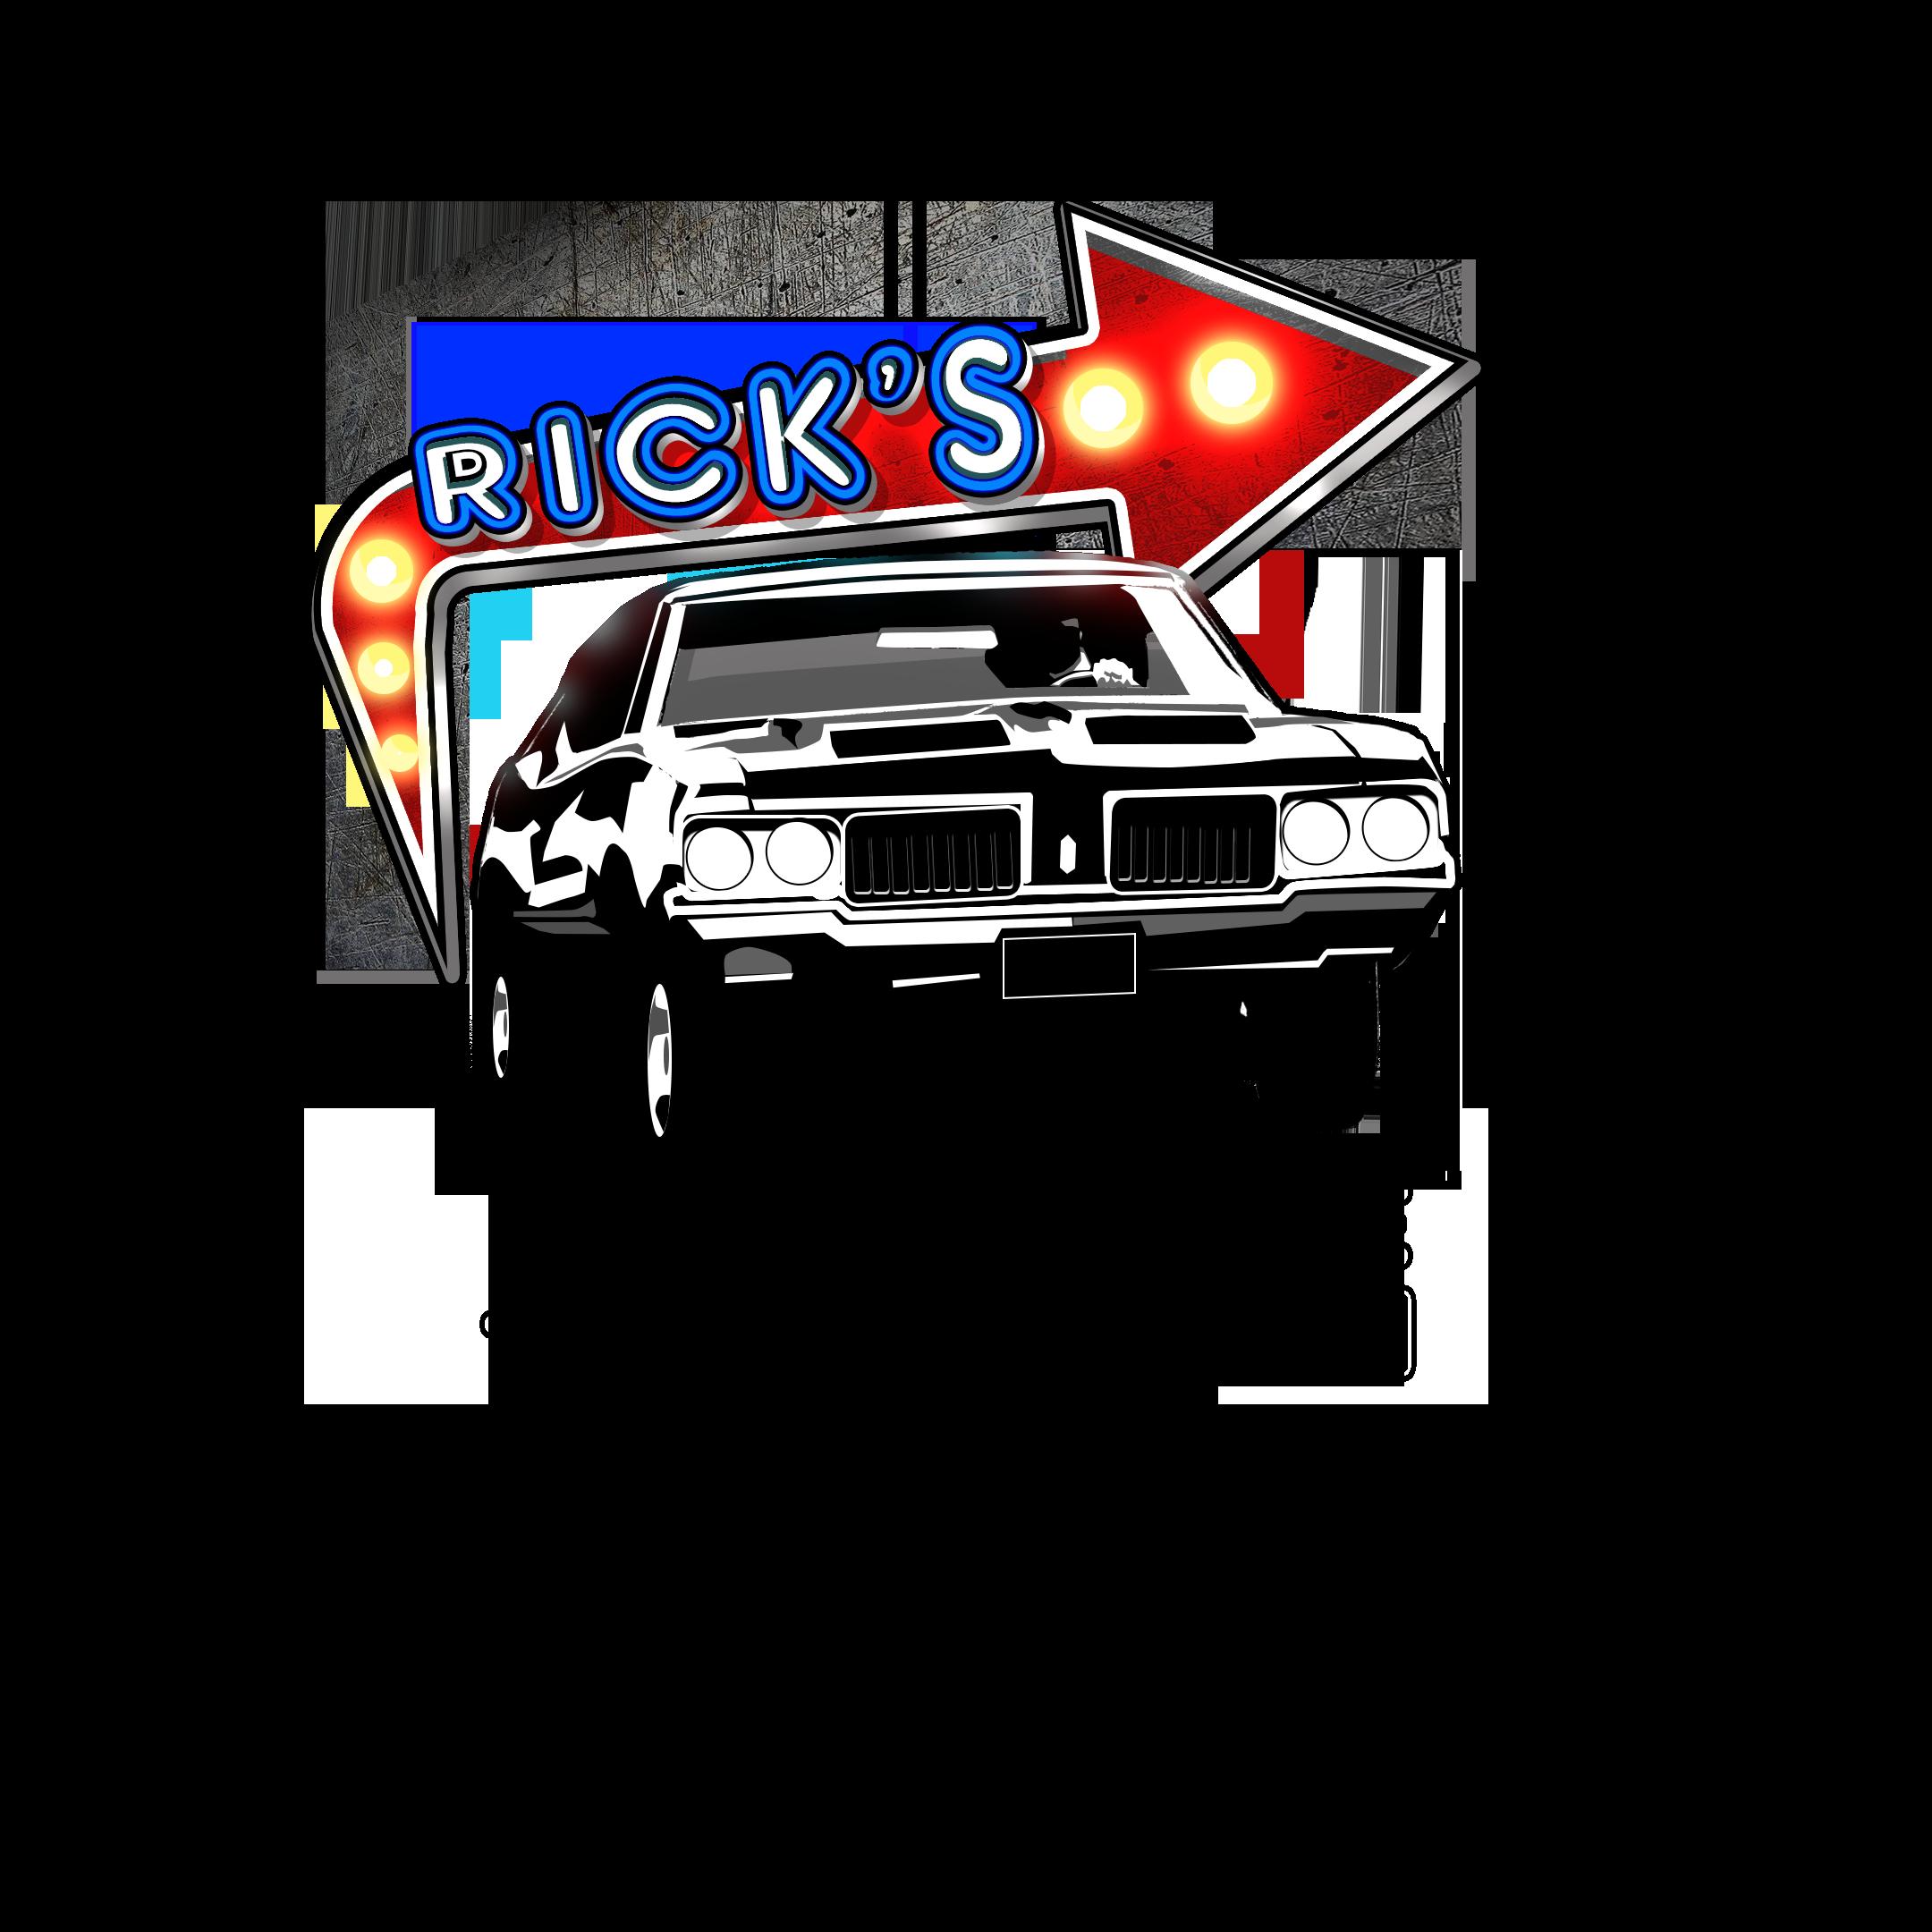 Ricks_Color_noFX.png